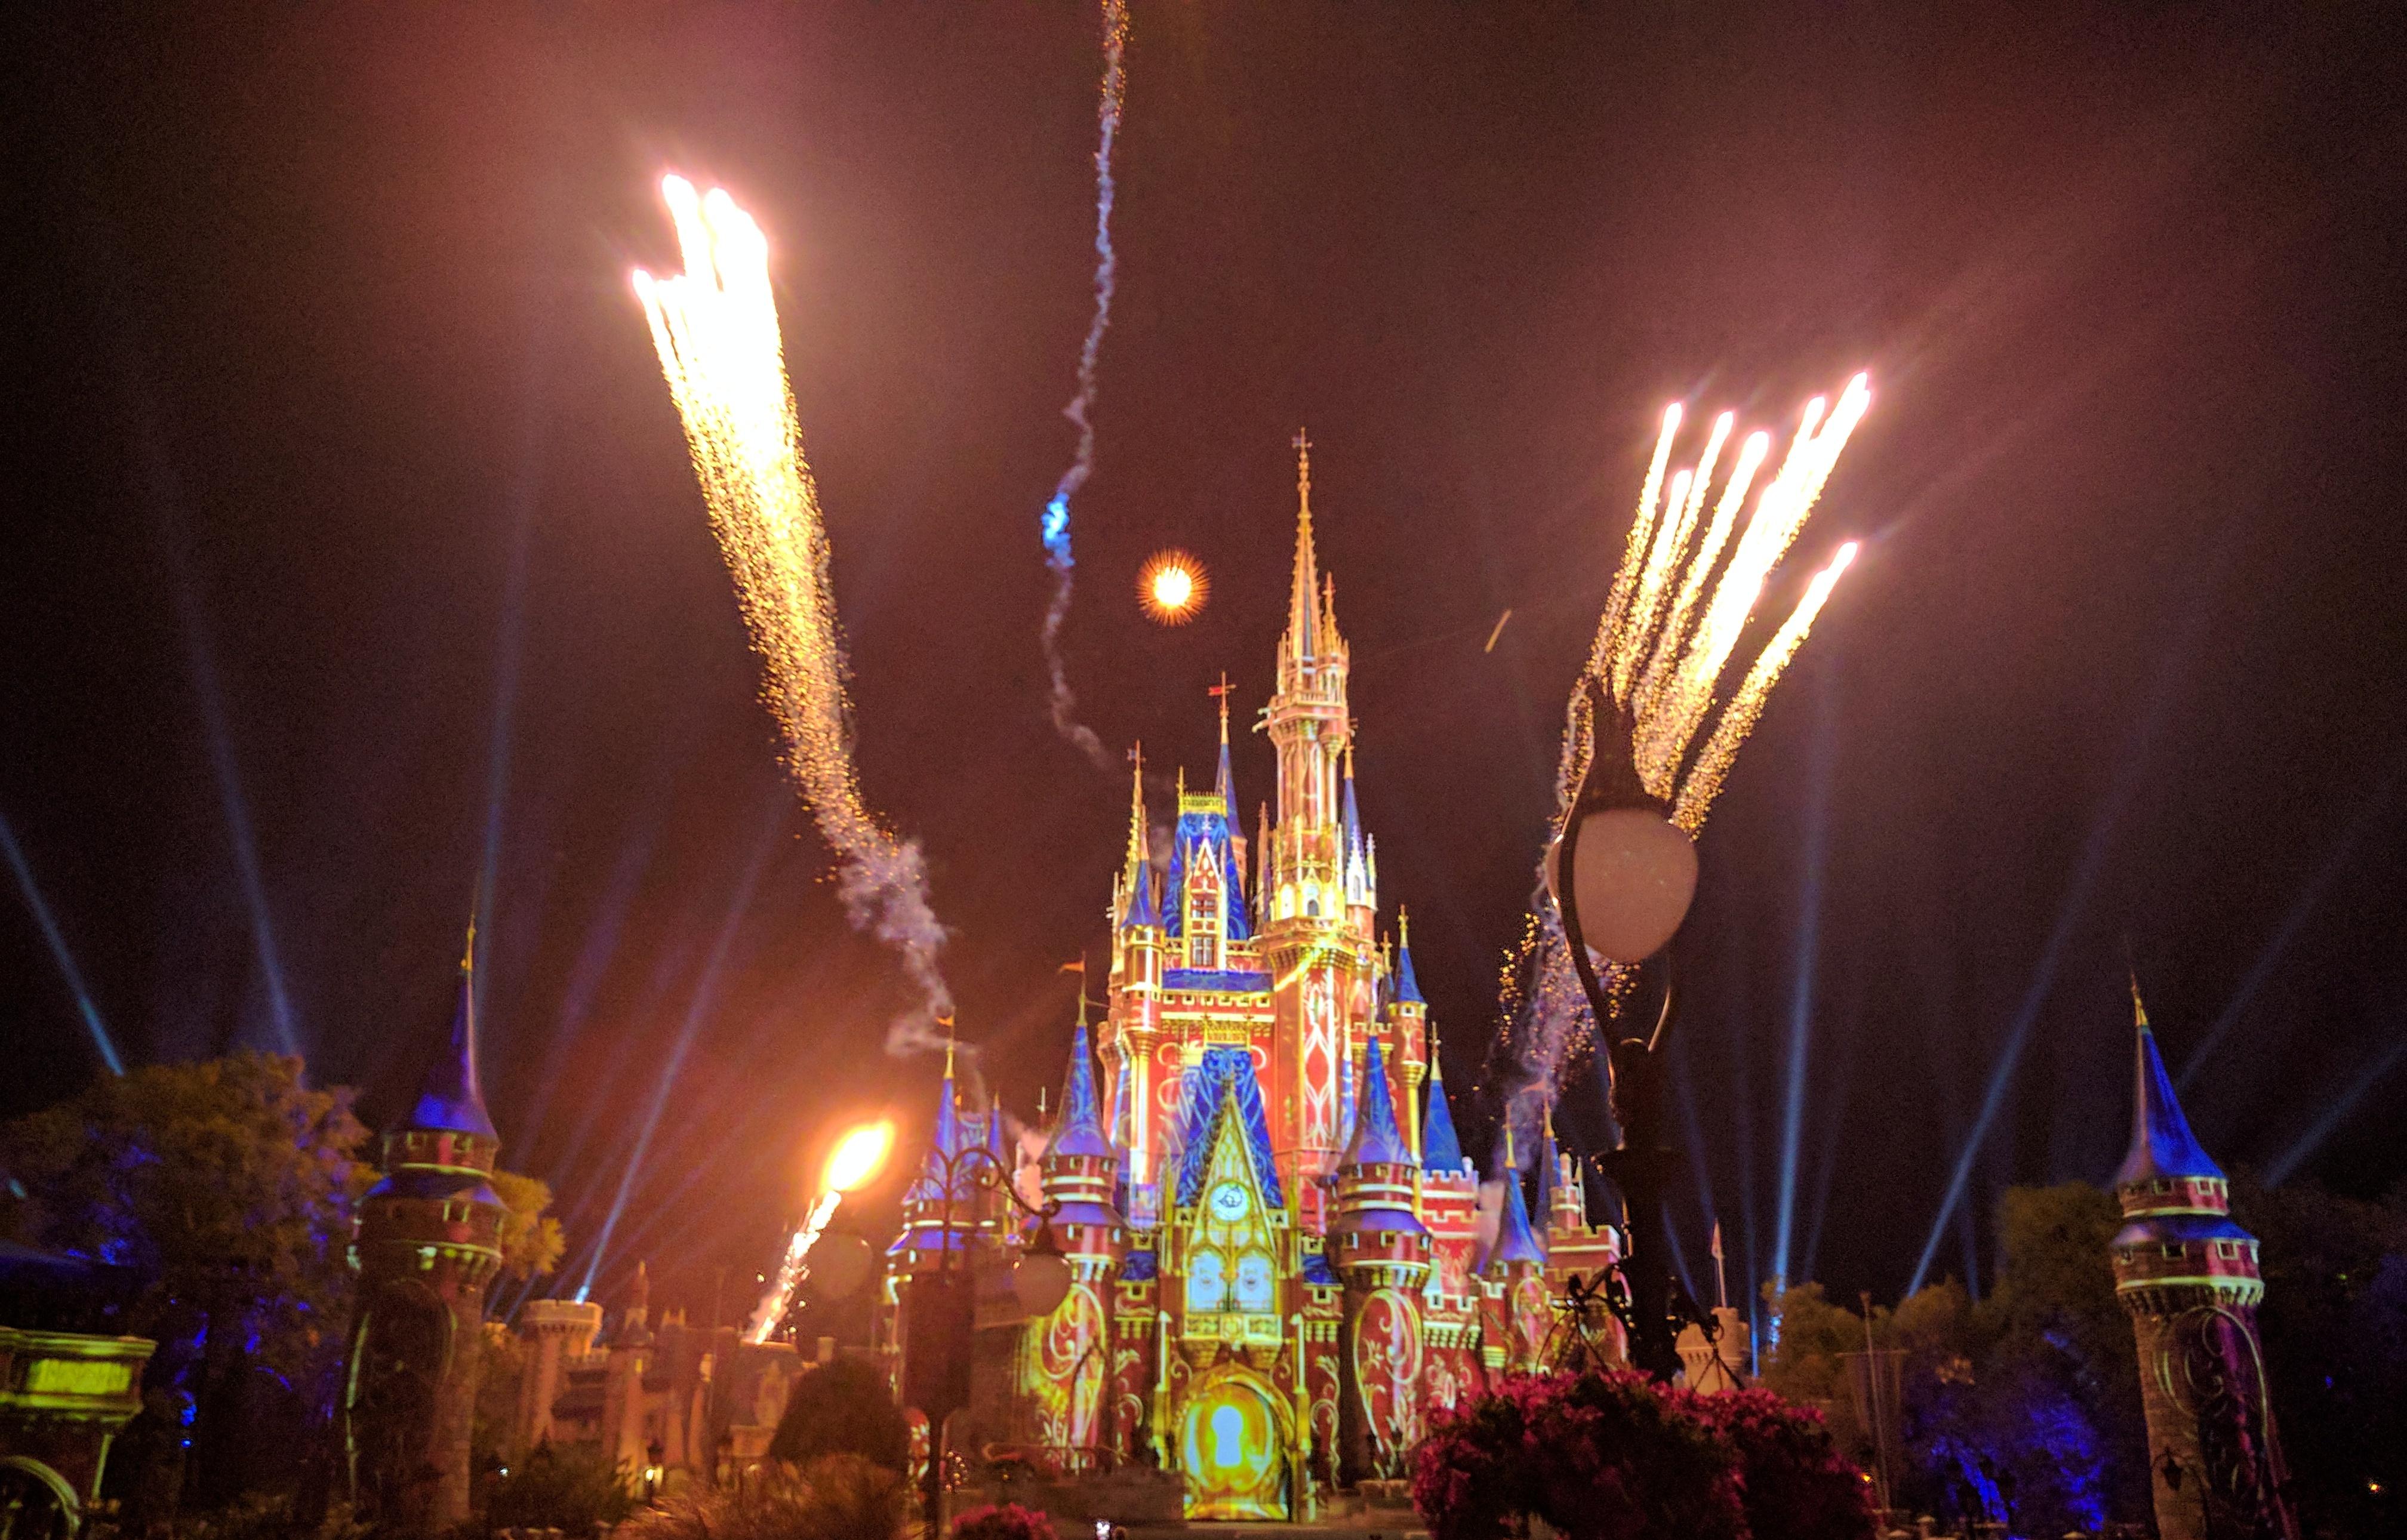 happily ever disney magic kingdom walt file wikipedia cropped commons horizons wikimedia wiki description